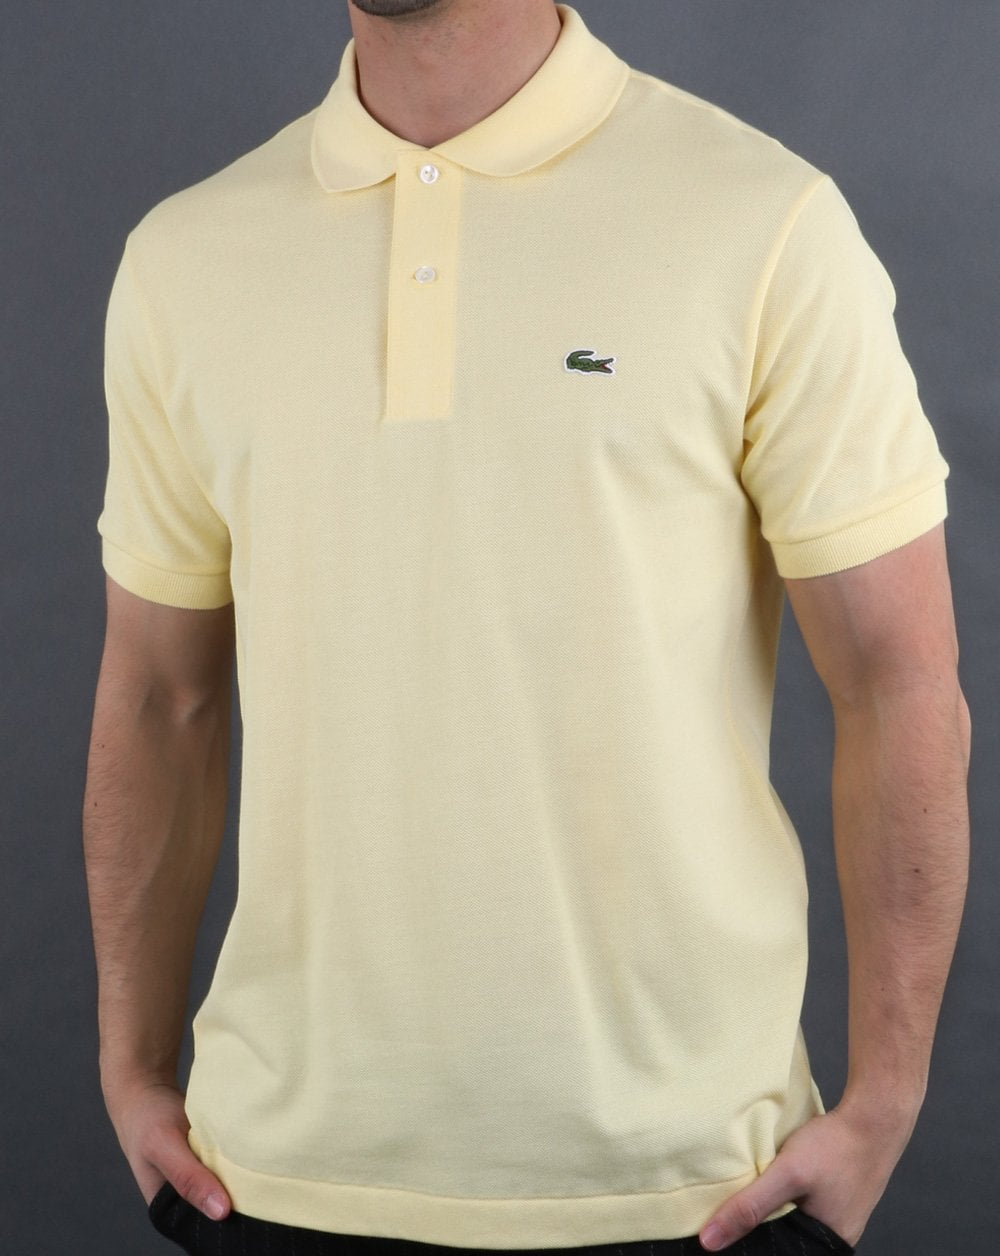 cc1c94b0e25 Fake Vs Real Lacoste Polo Shirts | Top Mode Depot